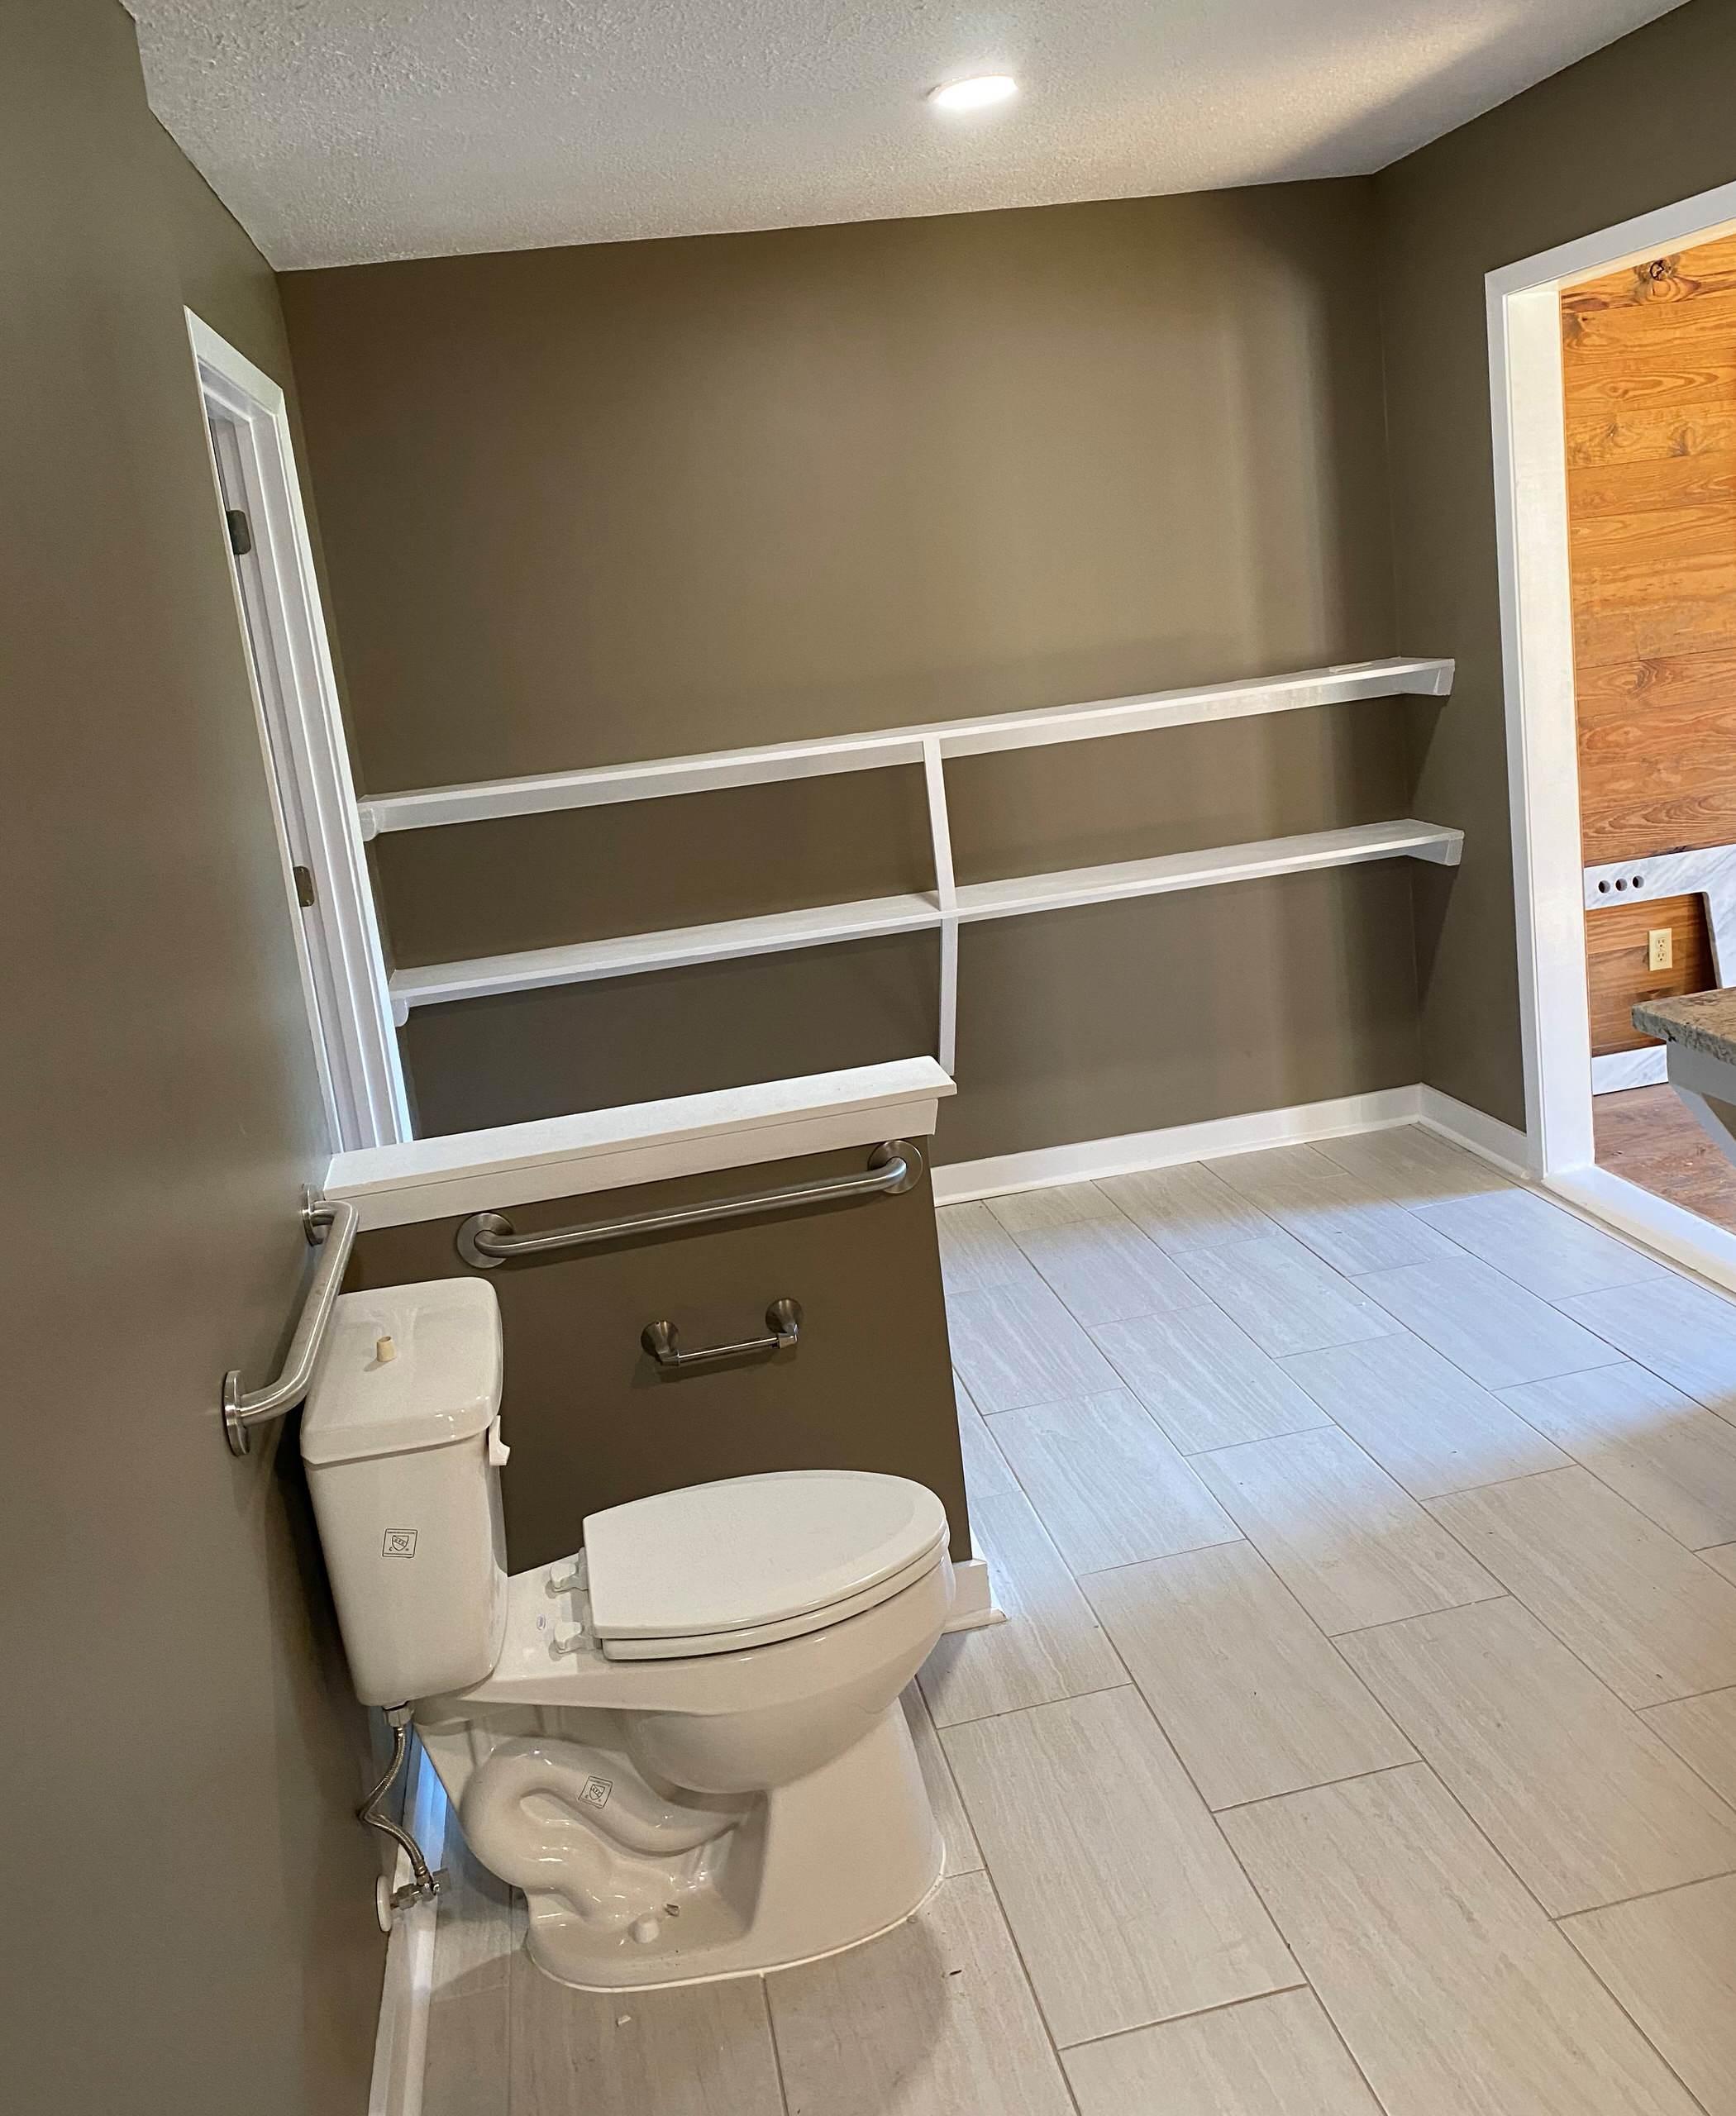 ADA Compliant Home